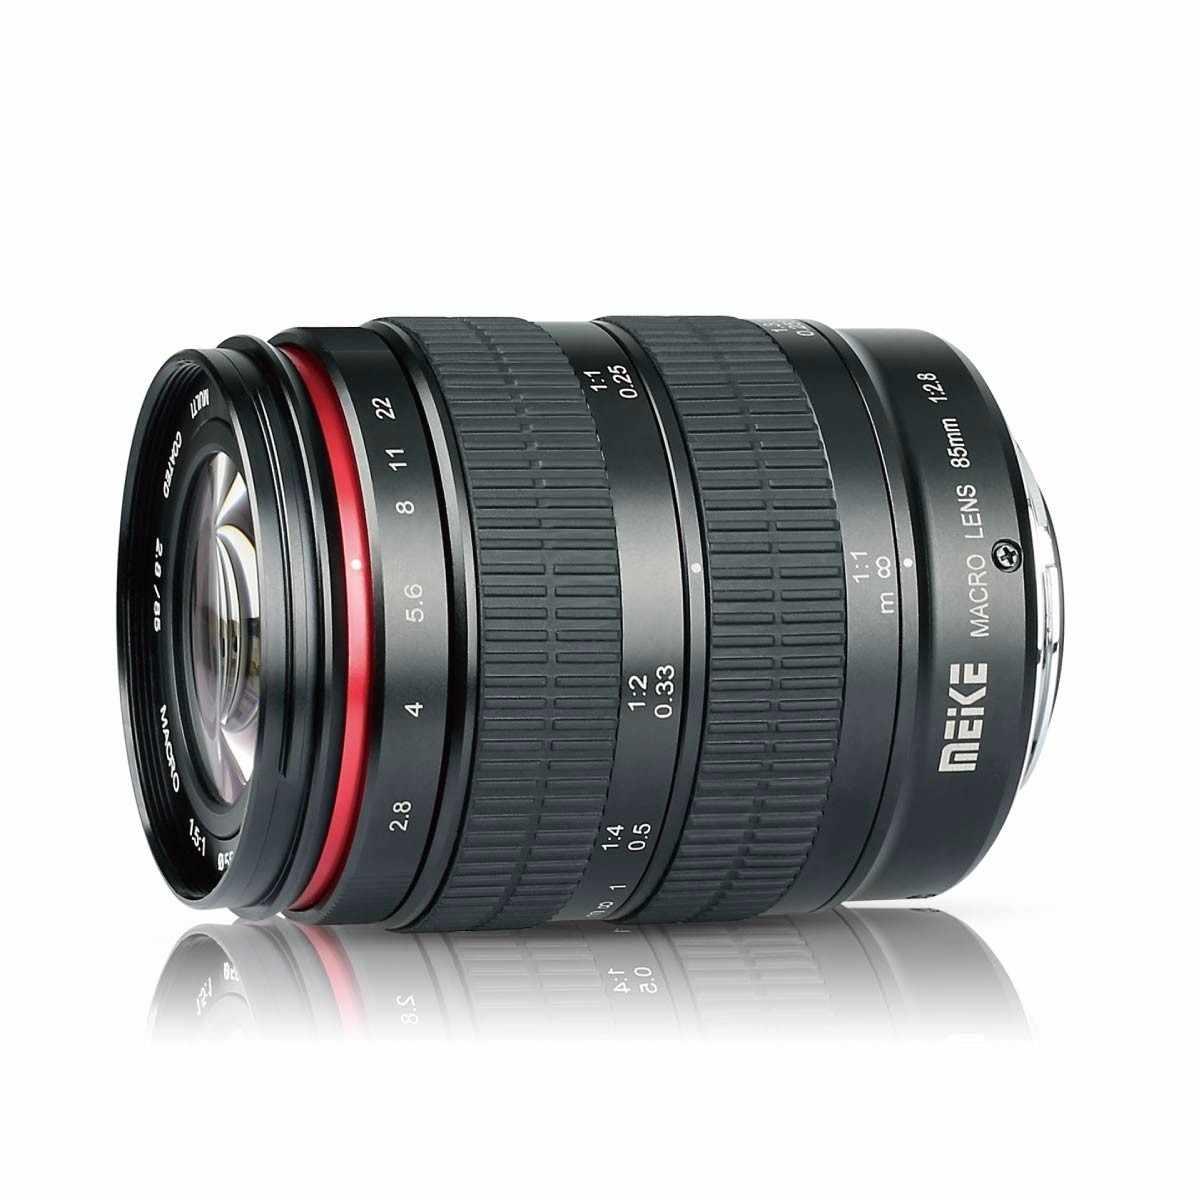 Meike 85 мм F/2,8 ручная фокусировка асферическая средняя телефото полная Рамка Prime макрообъектив для Canon Nikon sony Fujifilm Fuji X-Mount